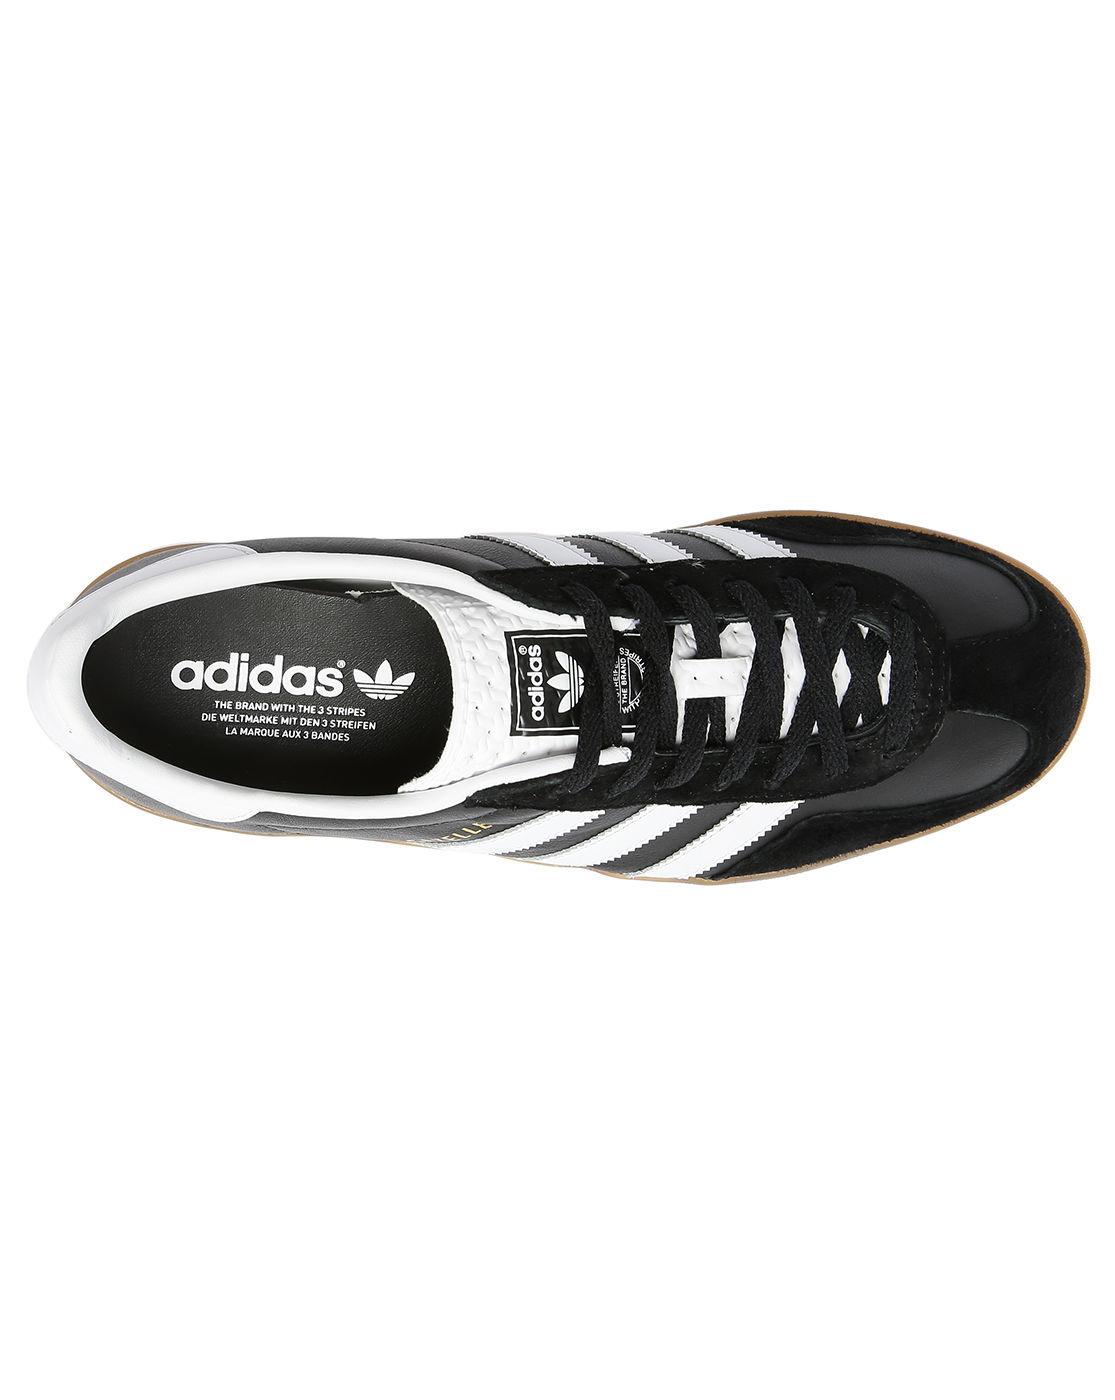 Adidas Originals Gazelle Indoor Sneakers Black